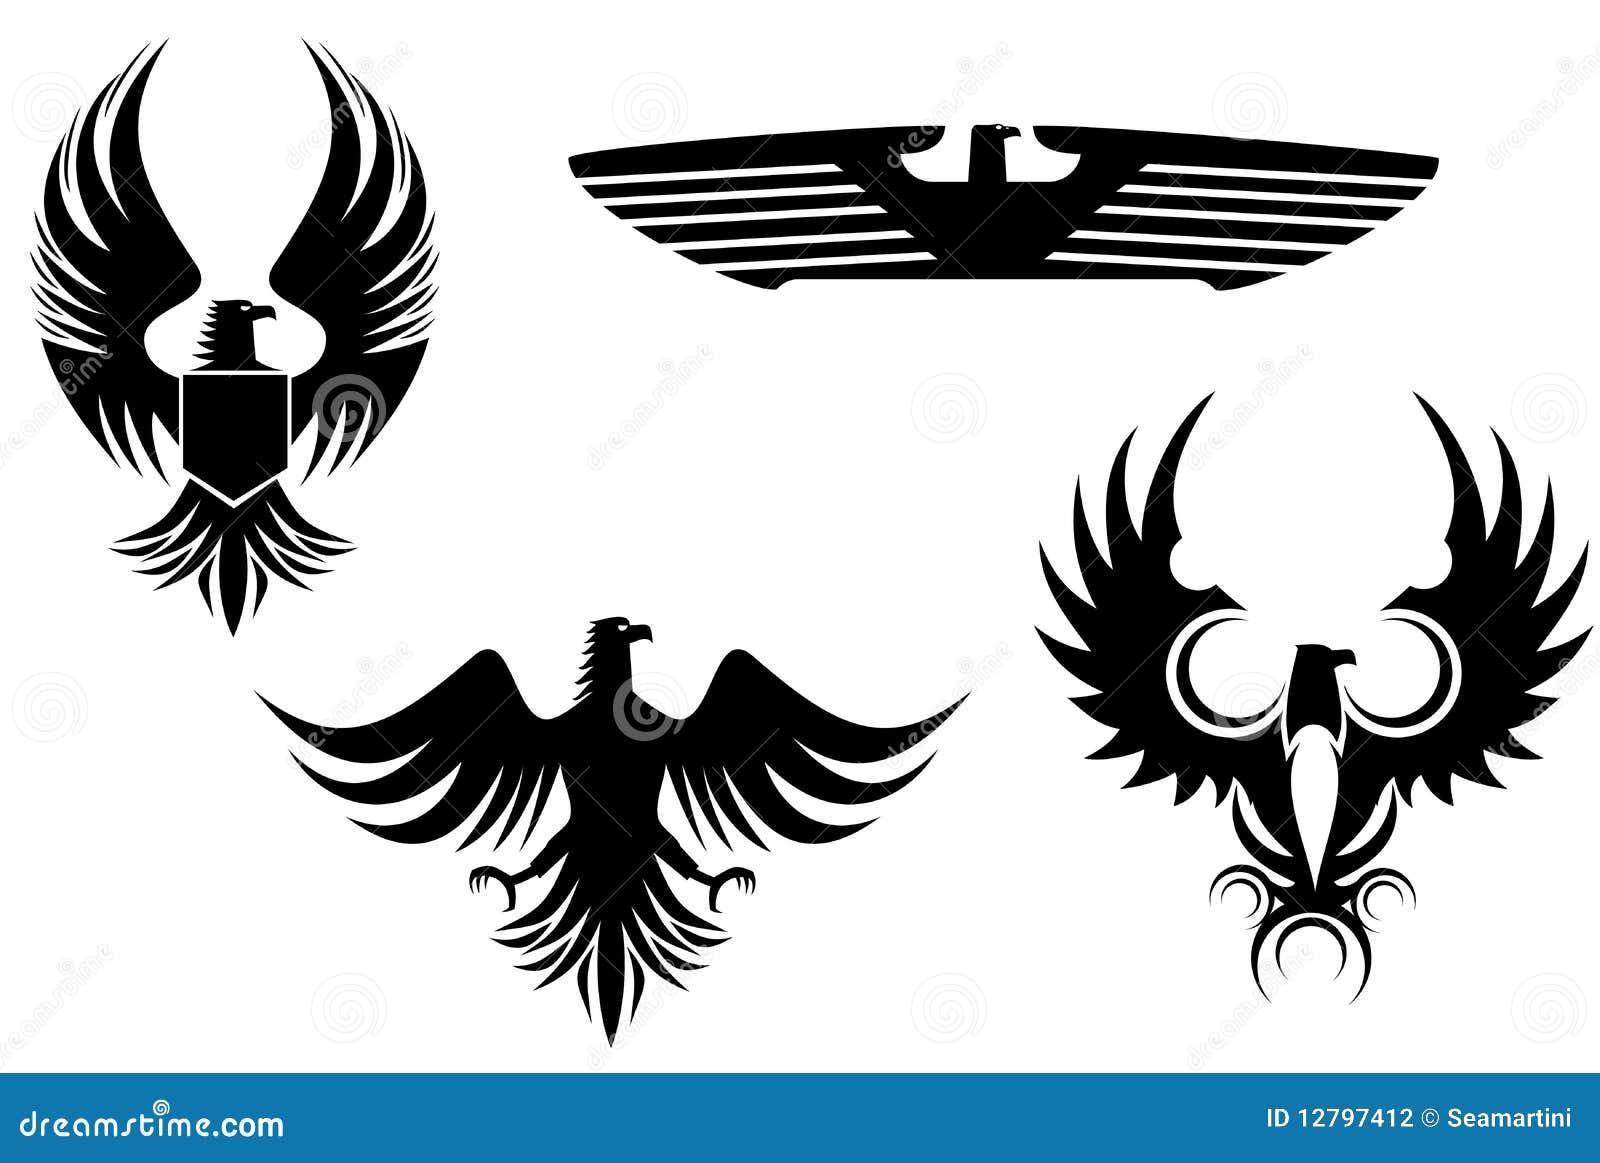 Eagle Tattoos Stock Vector Illustration Of Animal American 12797412 Eagle tattoo wallpaper free download